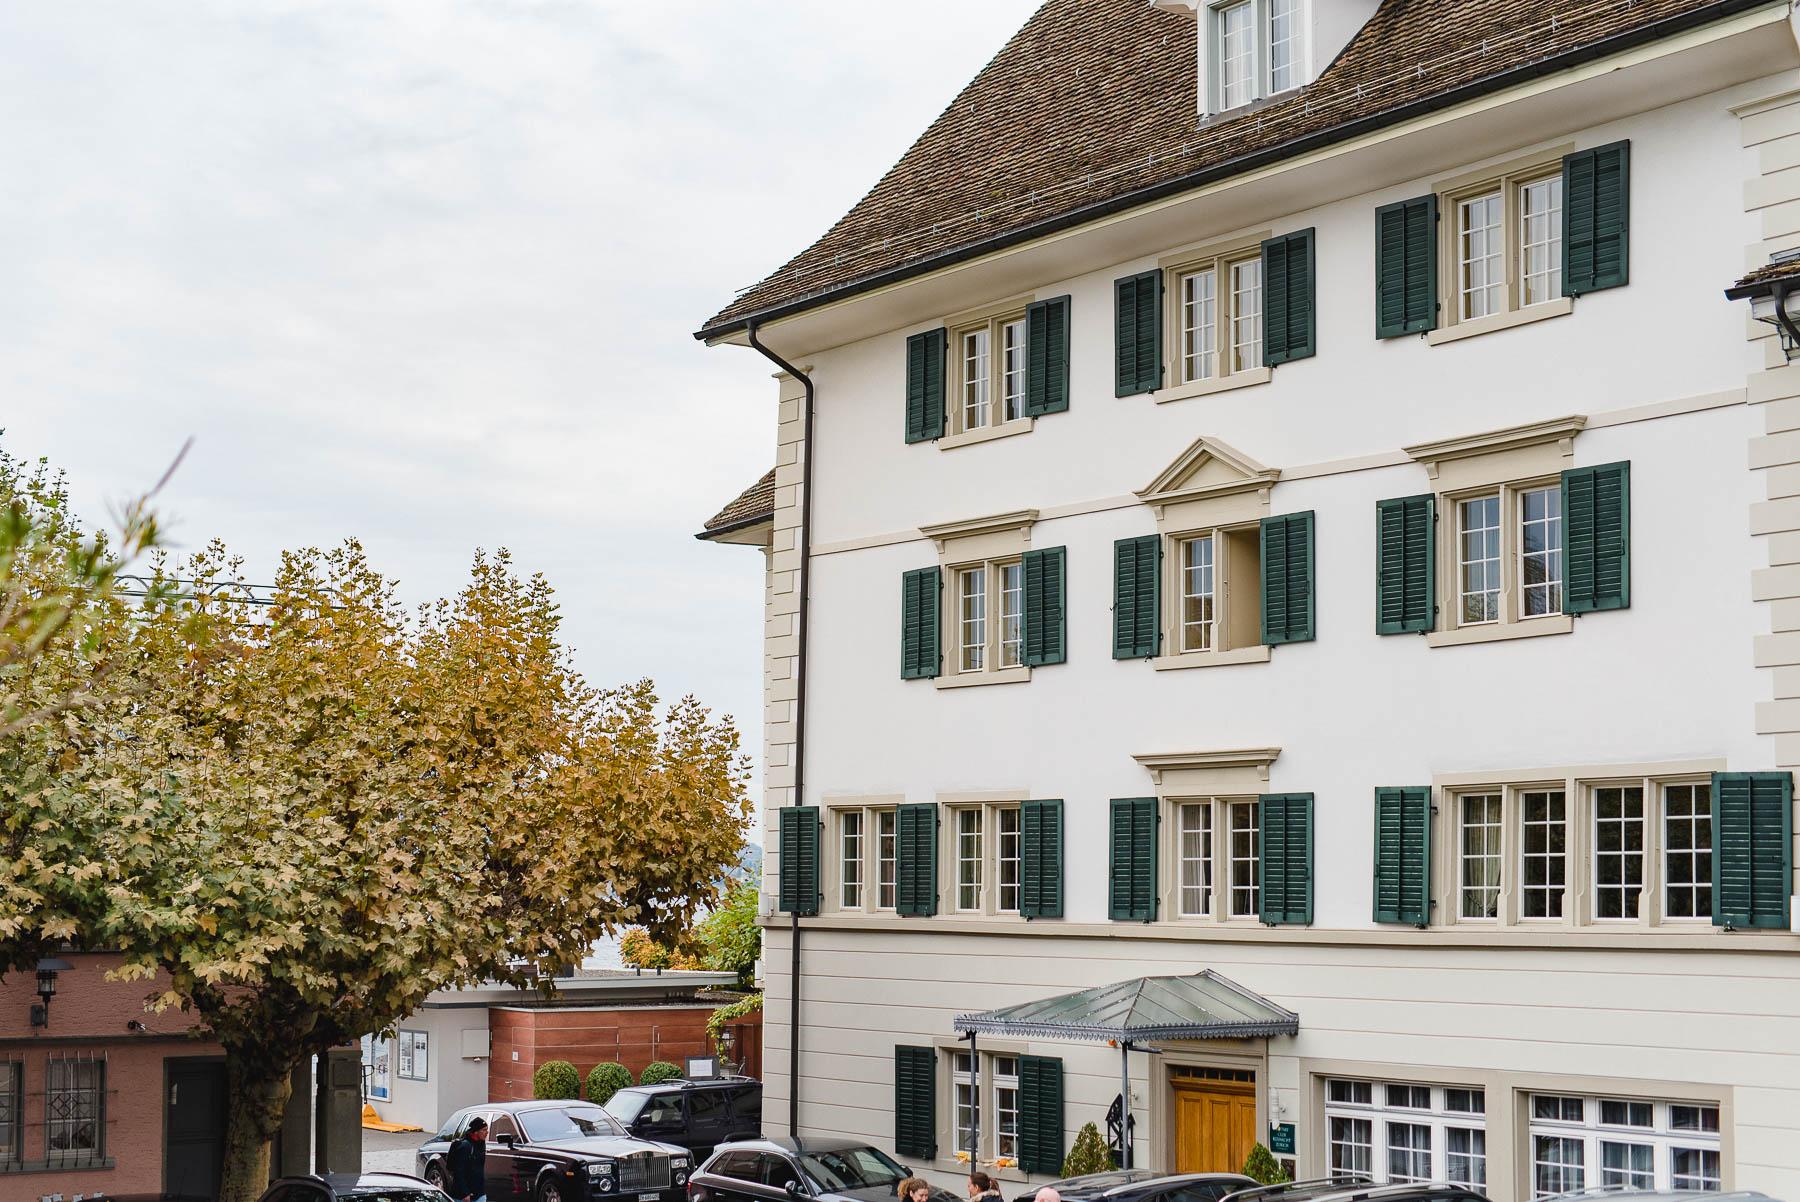 Romantik Seehotel Sonne Küsnacht